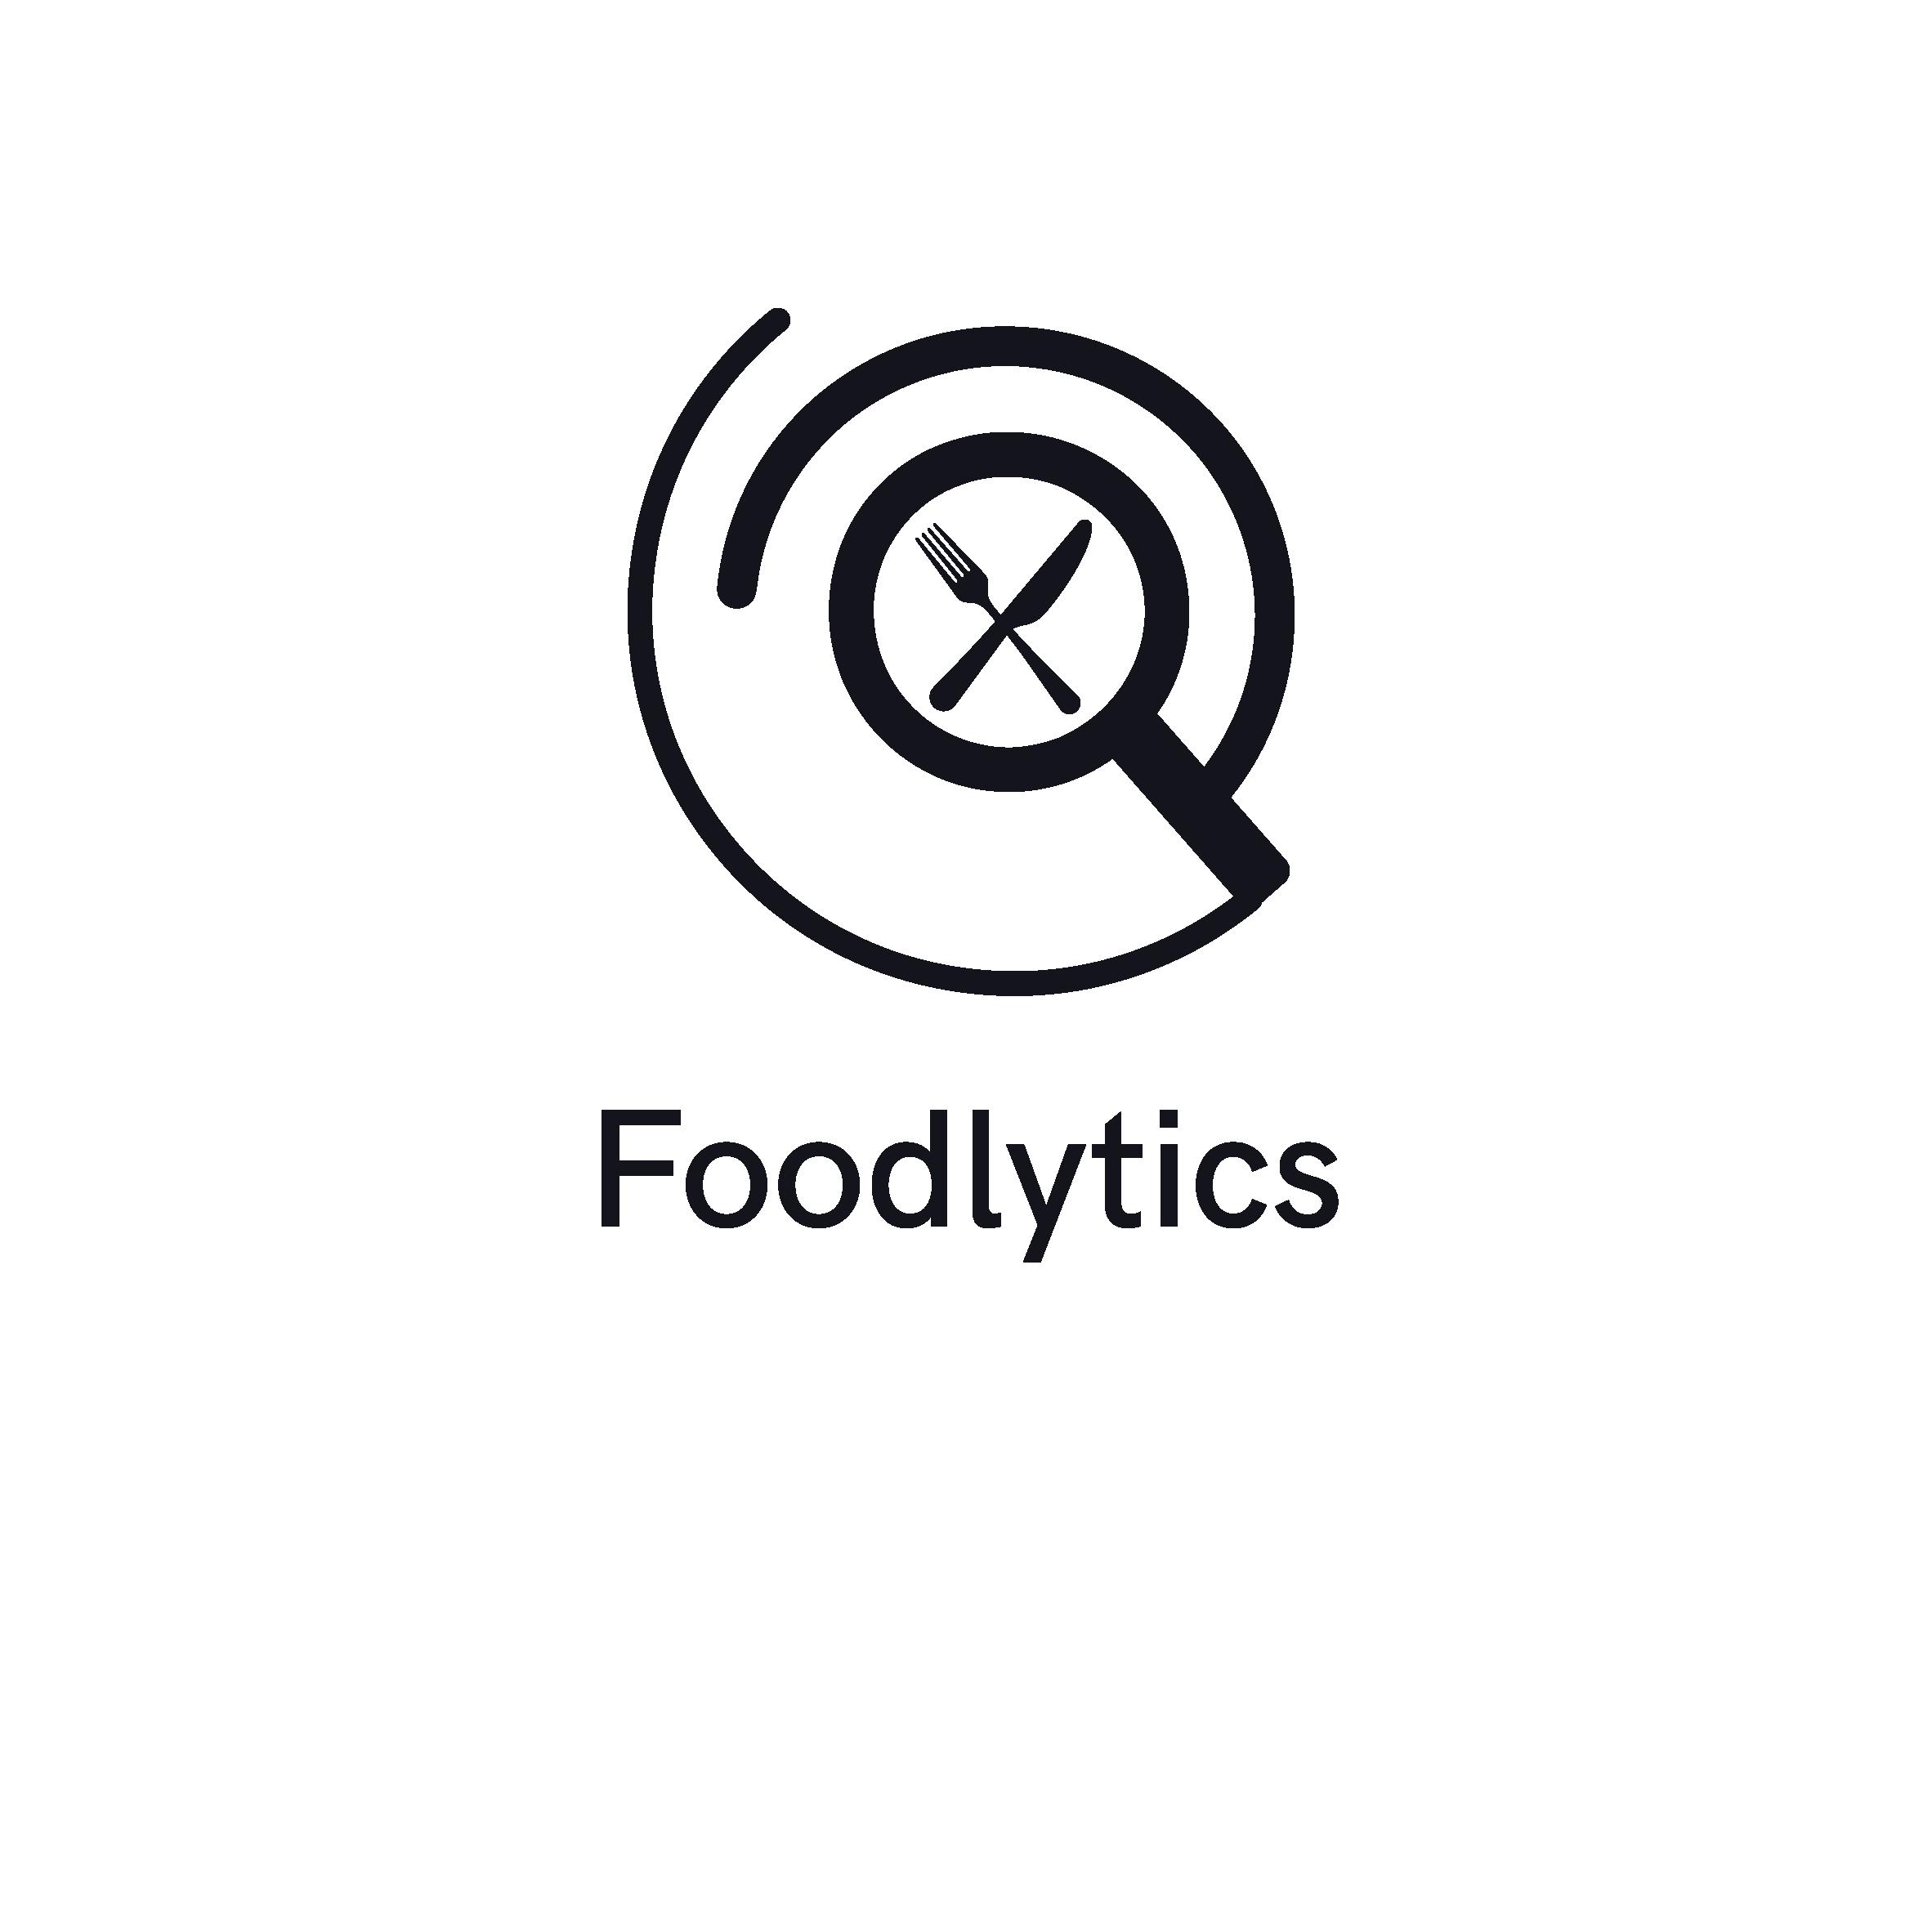 Foodlytics